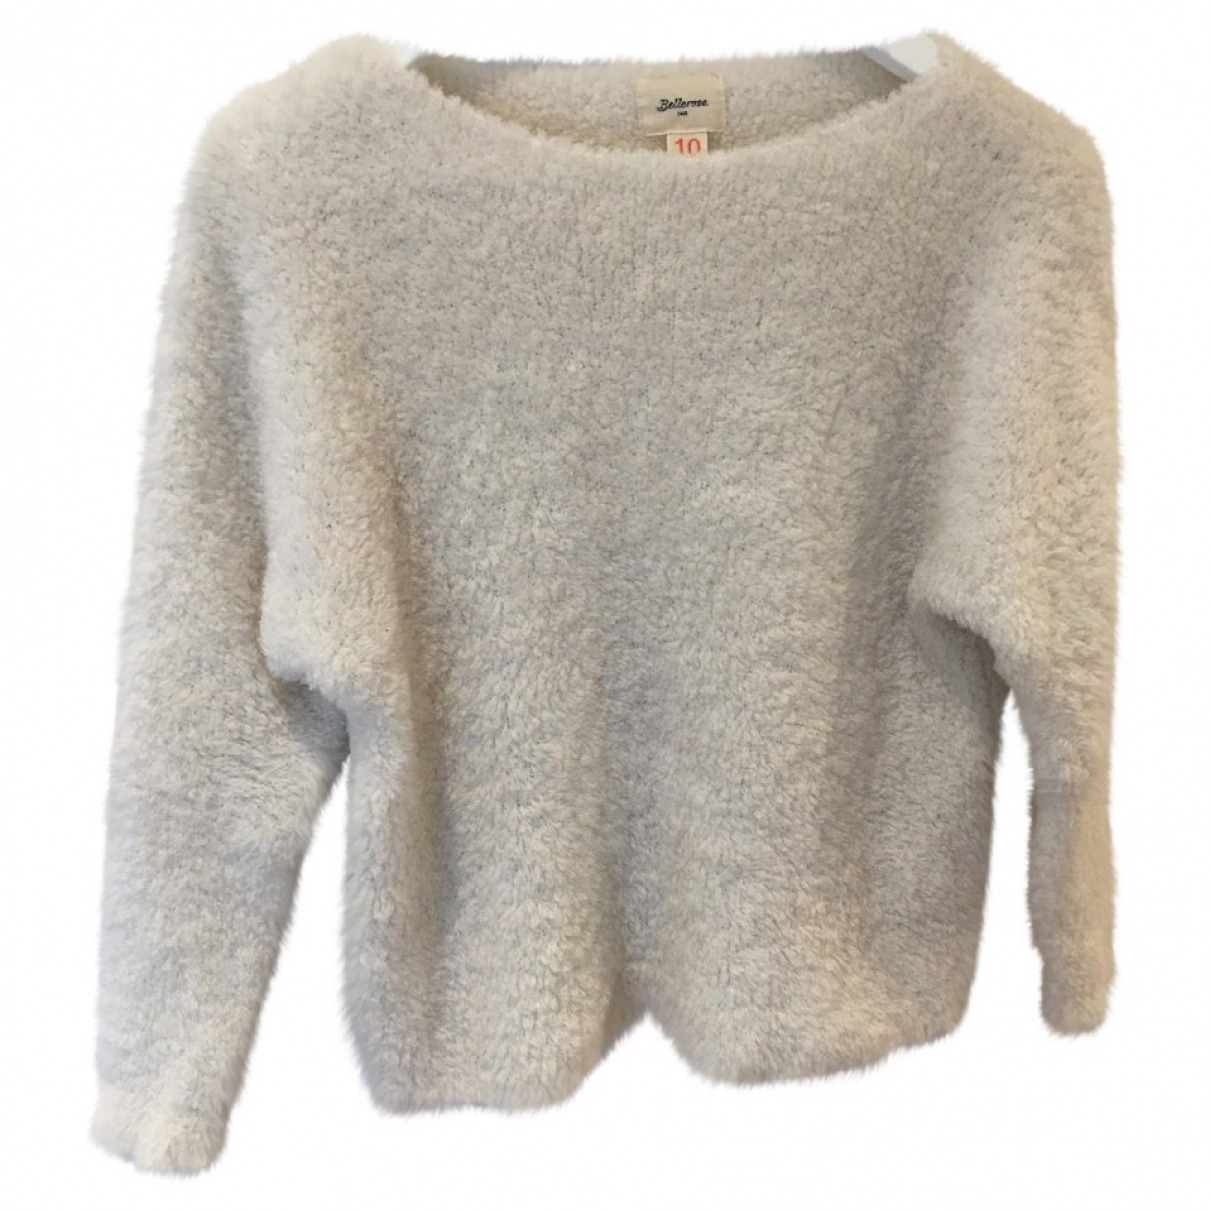 Bellerose \N Ecru Wool Knitwear for Kids 10 years - up to 142cm FR